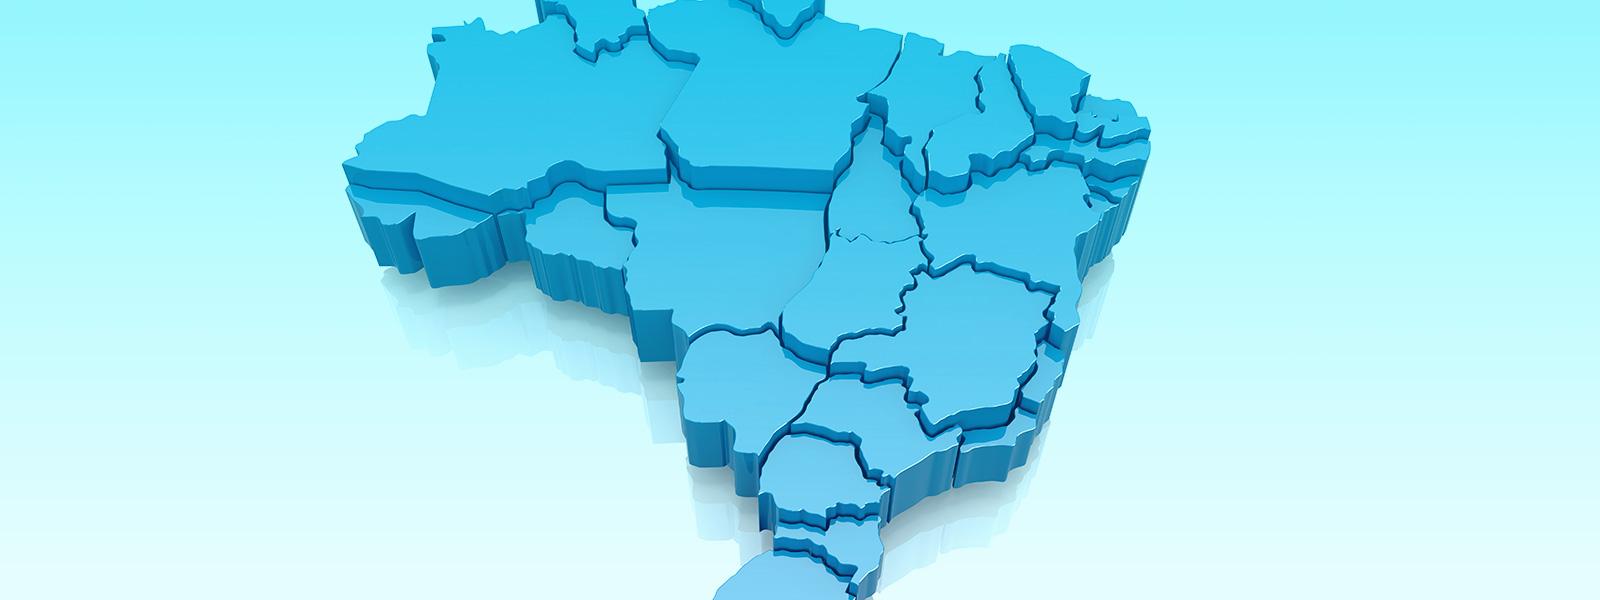 presenca-ceabs-brasil-blog